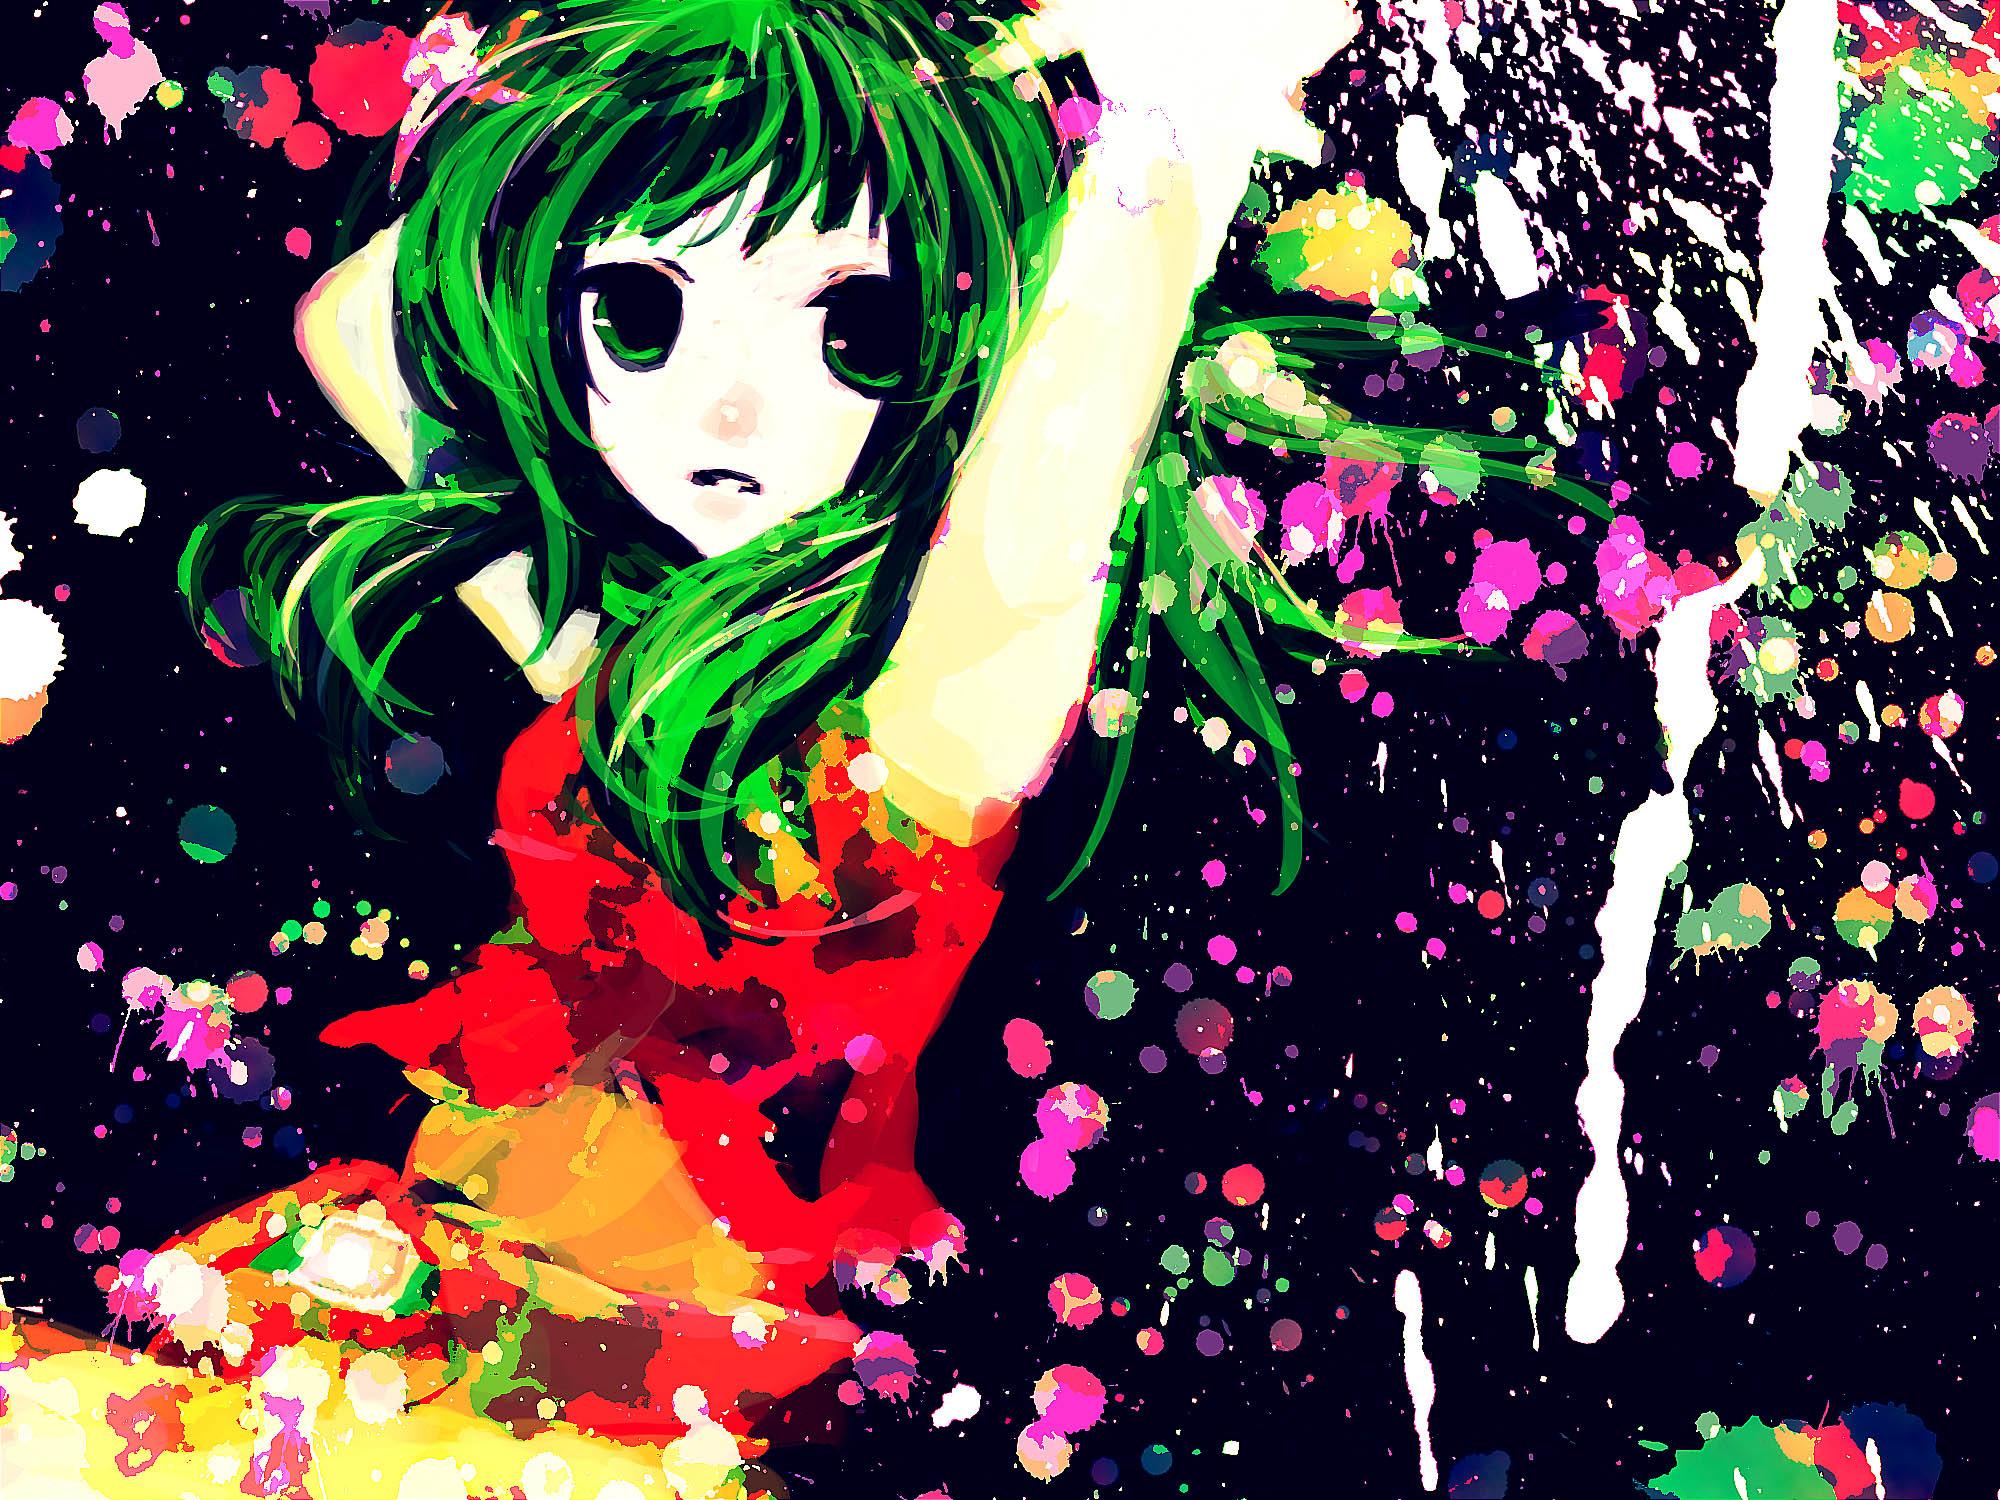 Gumi/Megpoid [Vocaloid]